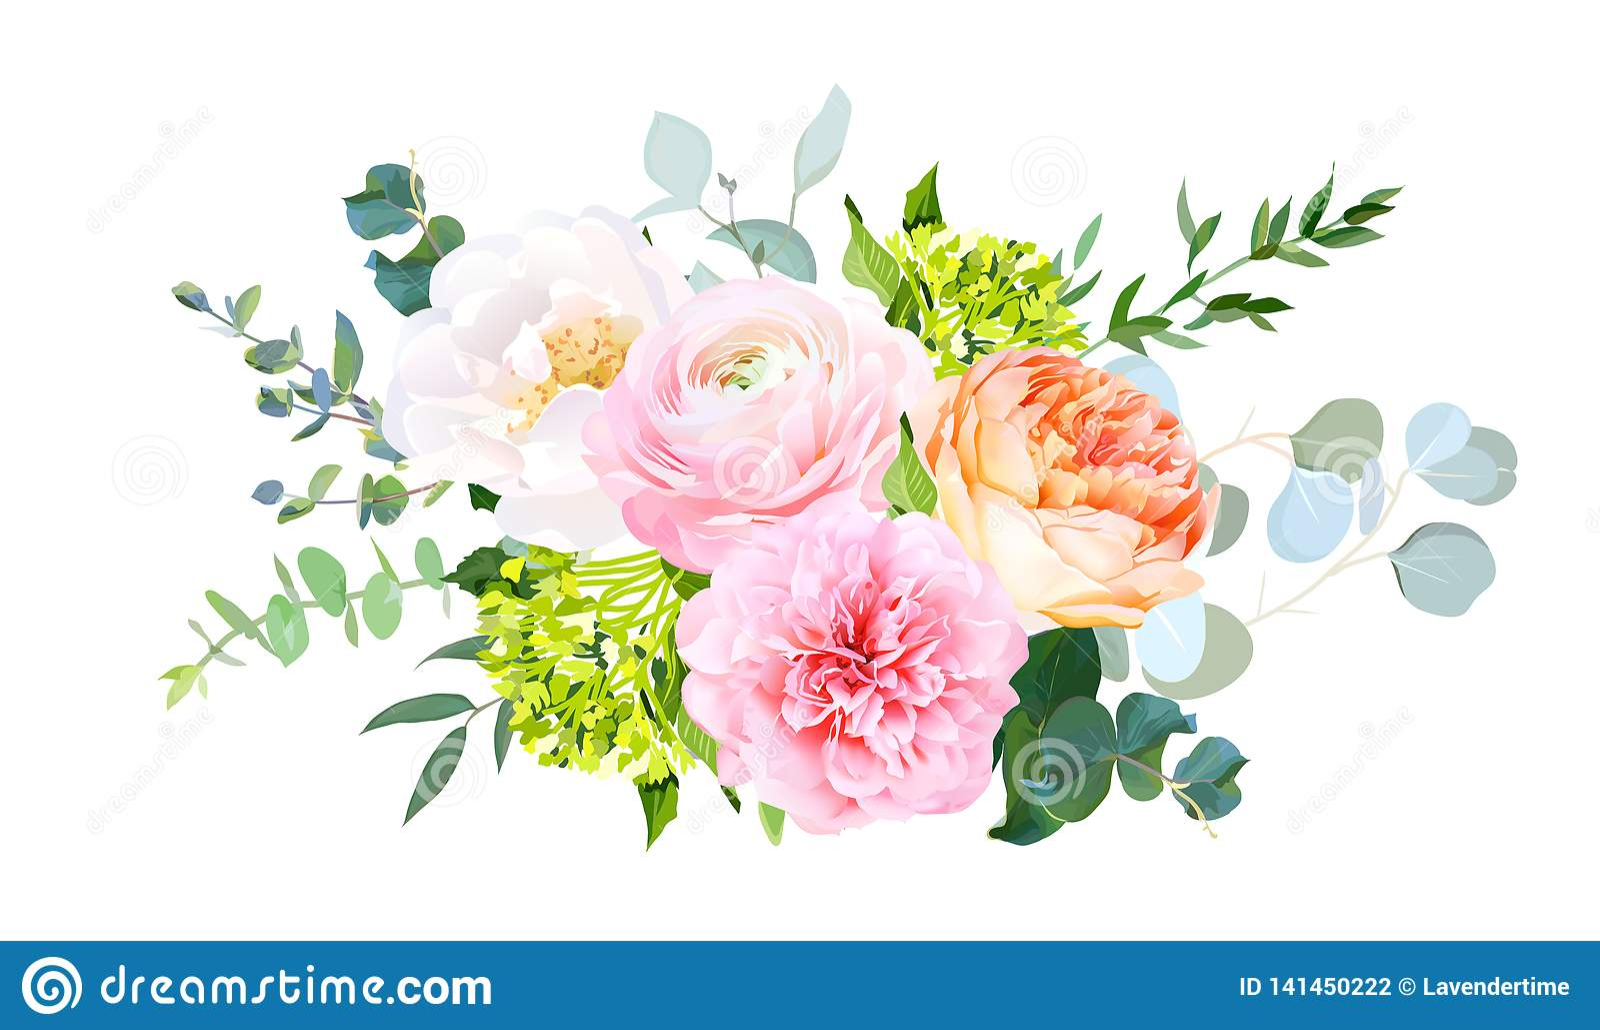 Coral Juliet Garden Rose Pink Ranunculus Peony Green Hydrangea Eucalyptus Stock Vector Illustration Of Boho Collection 141450222